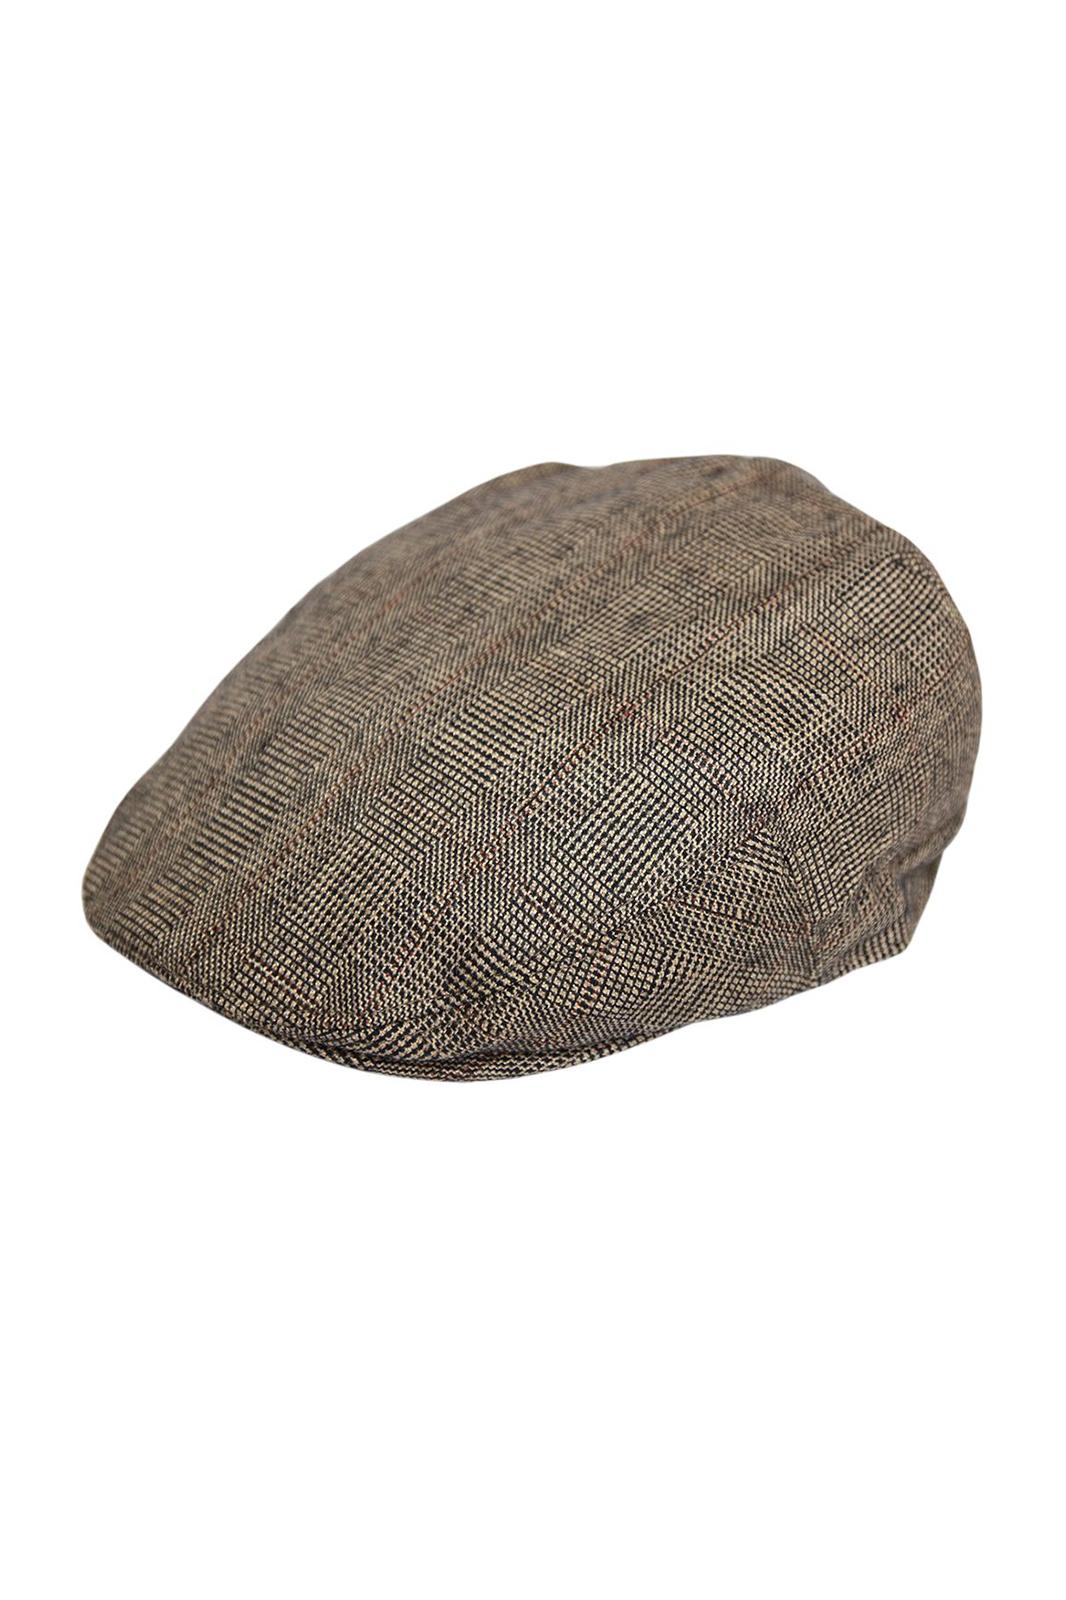 G&H Check Flat Cap Brown